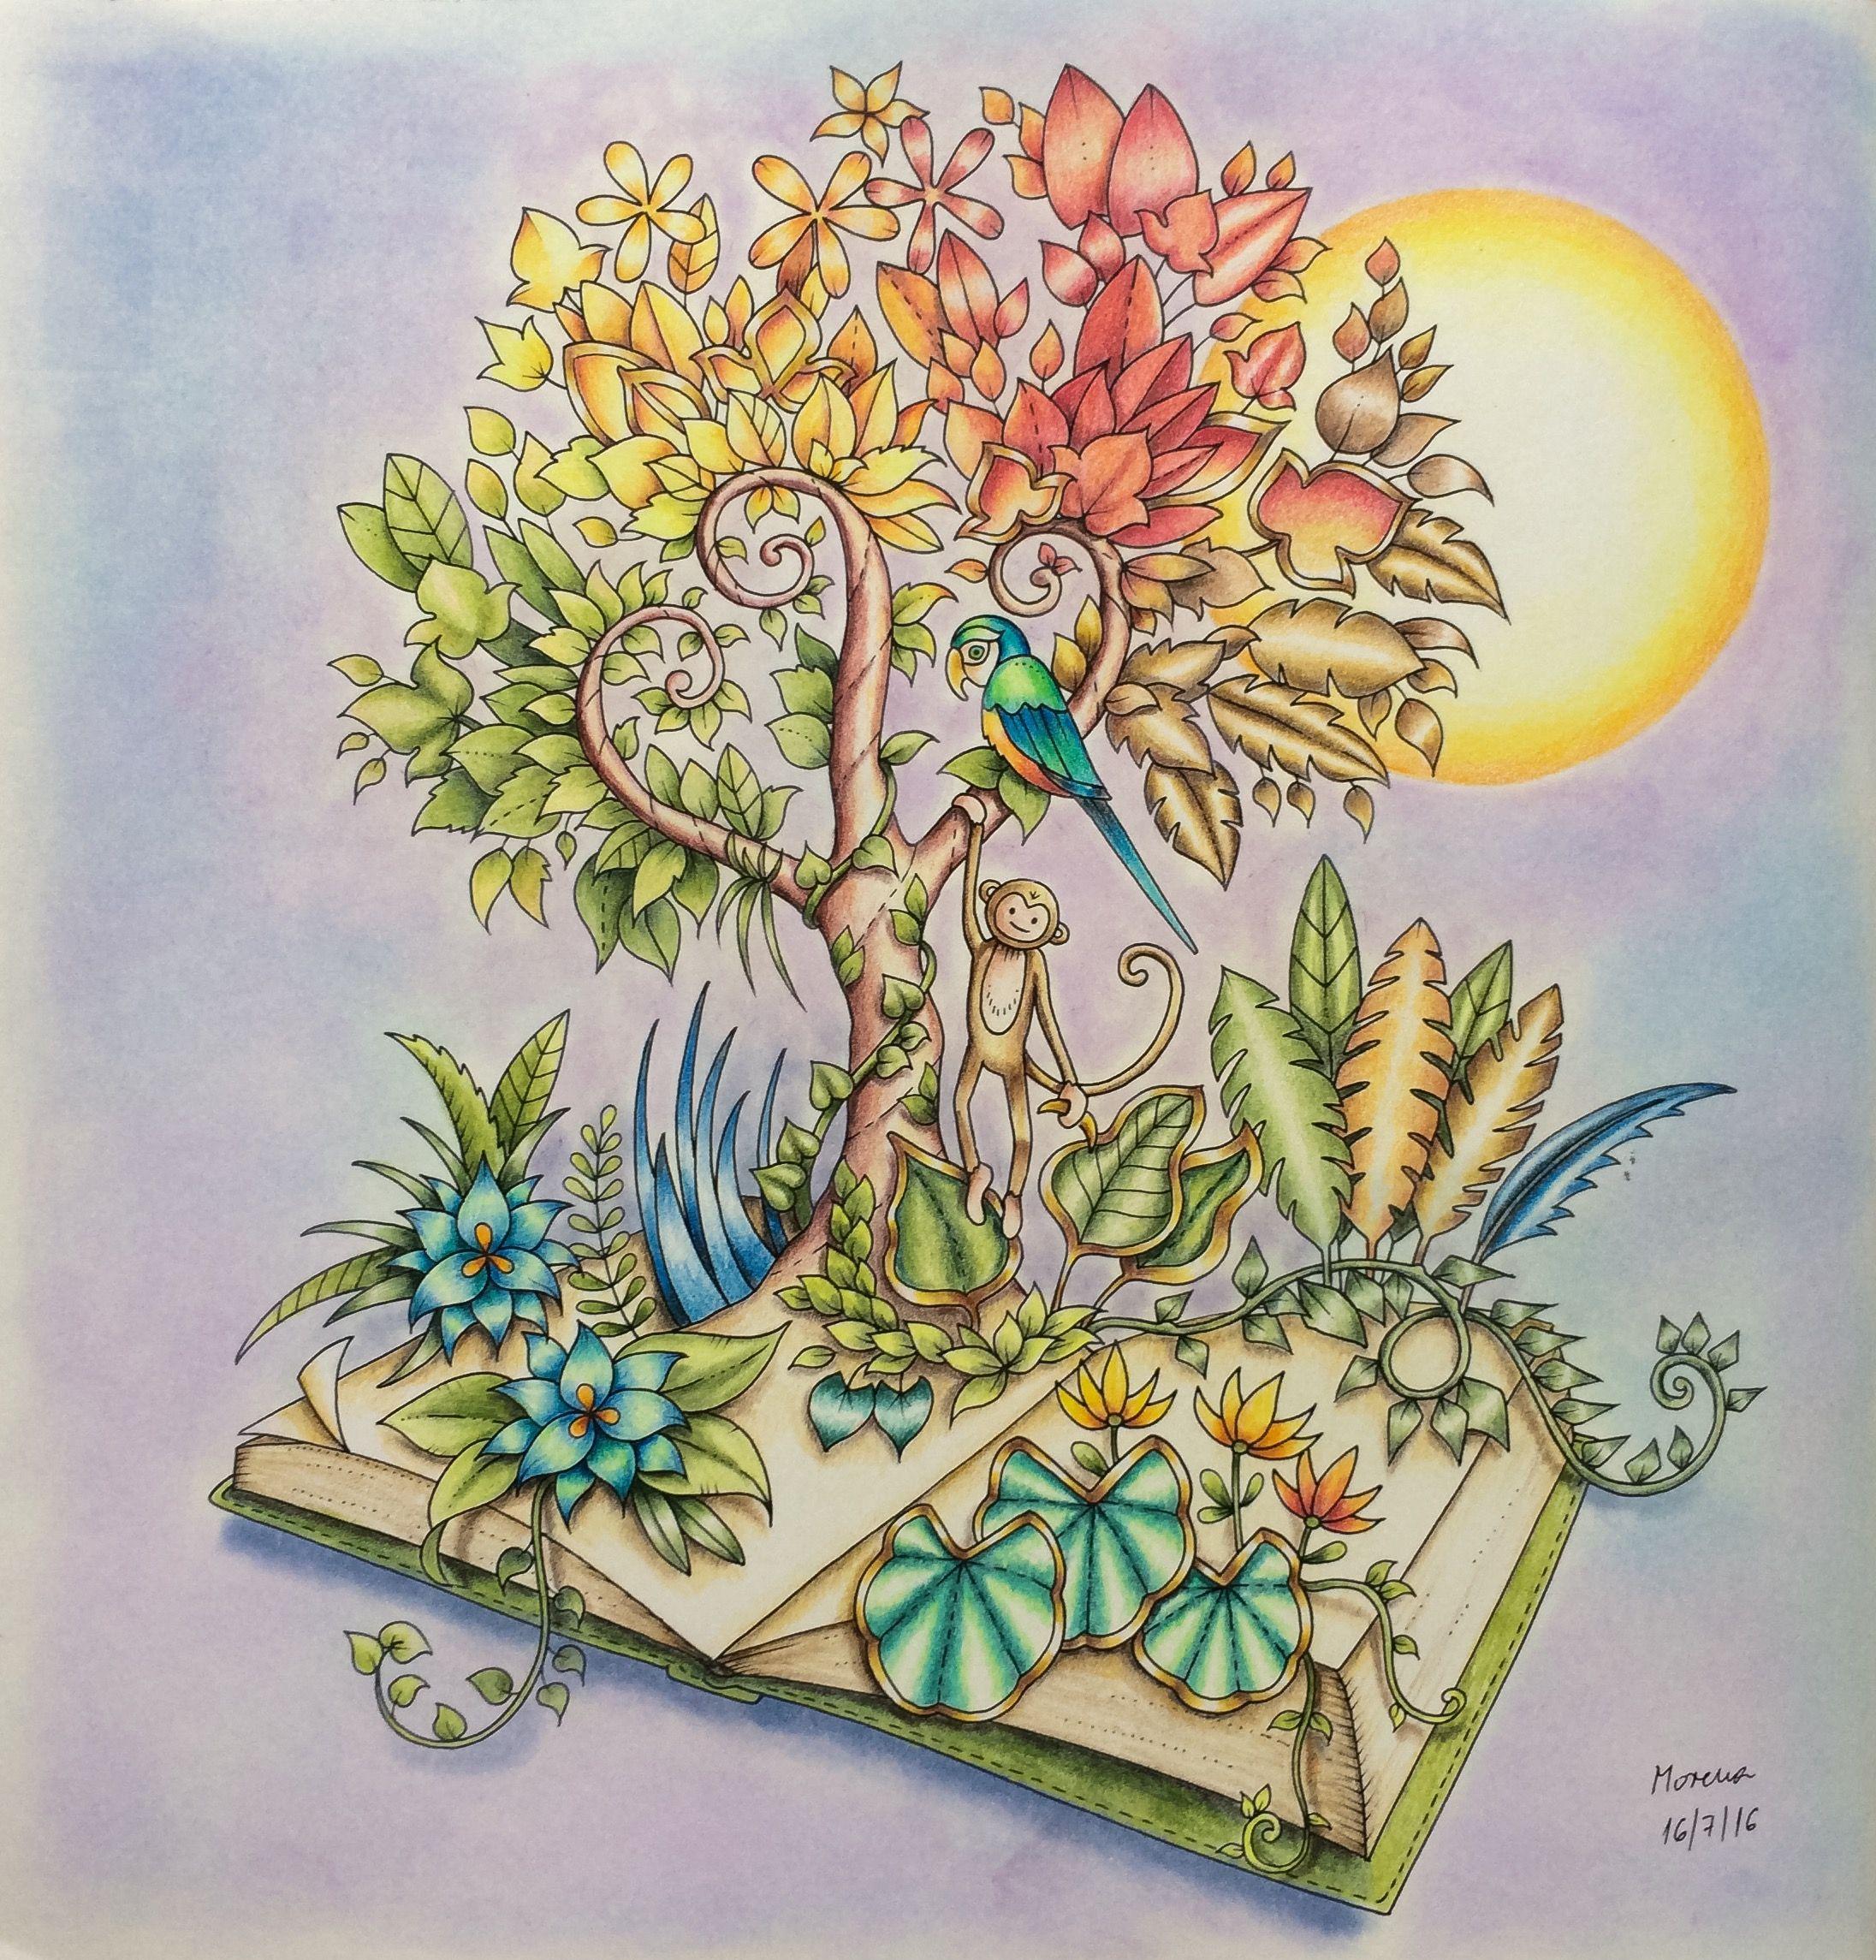 Magical Jungle By Johanna Basford Coloured Morena Vajak